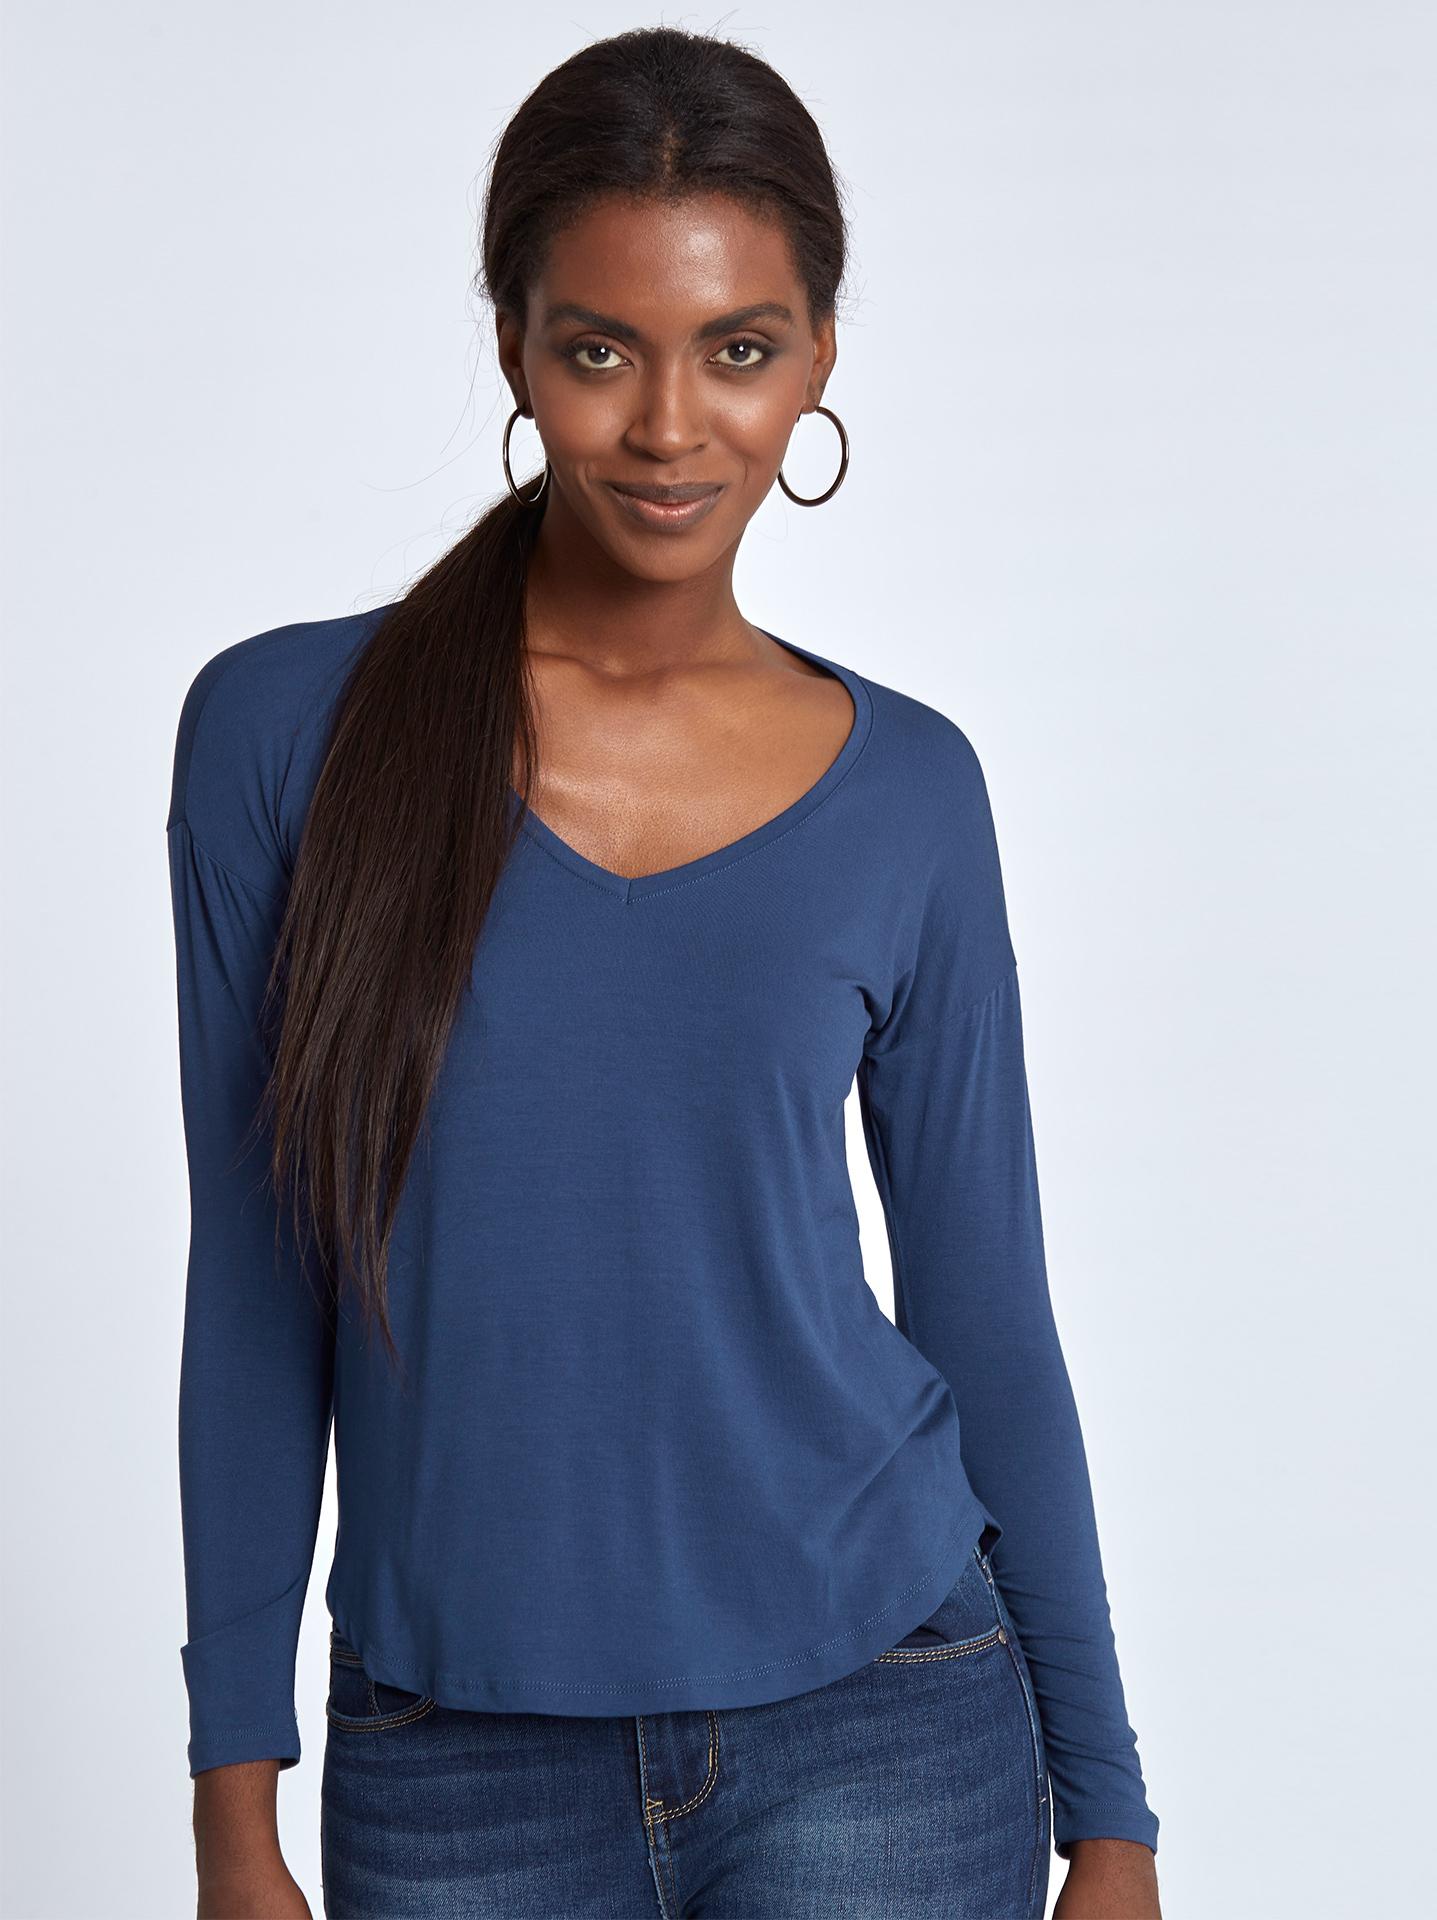 b0b44ca451b4 Μπλούζα με καμπύλη στο τελείωμα σε μπλε